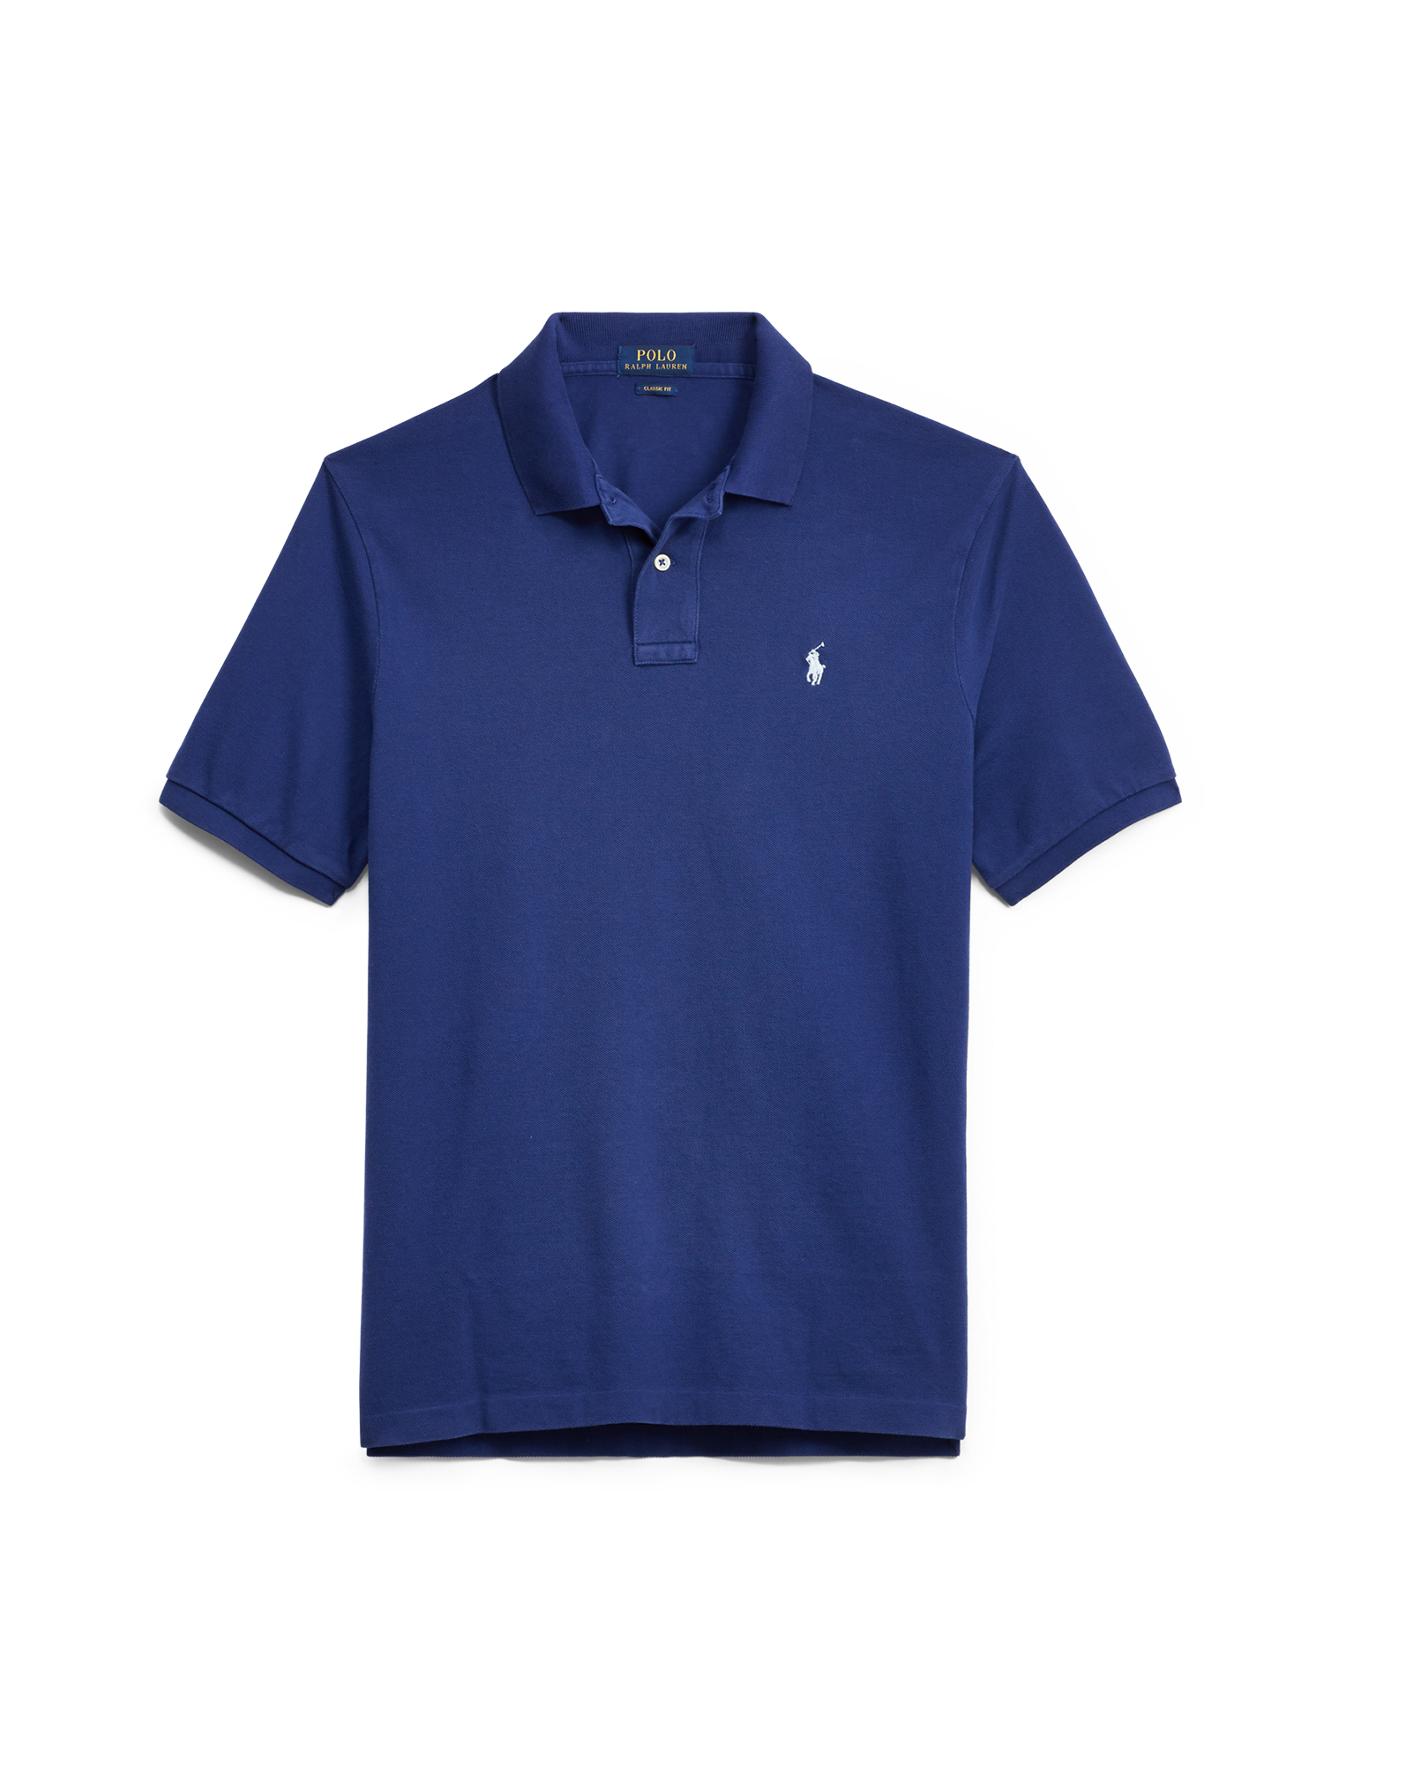 ralph lauren polo shirts prices dubai 72d758e72f